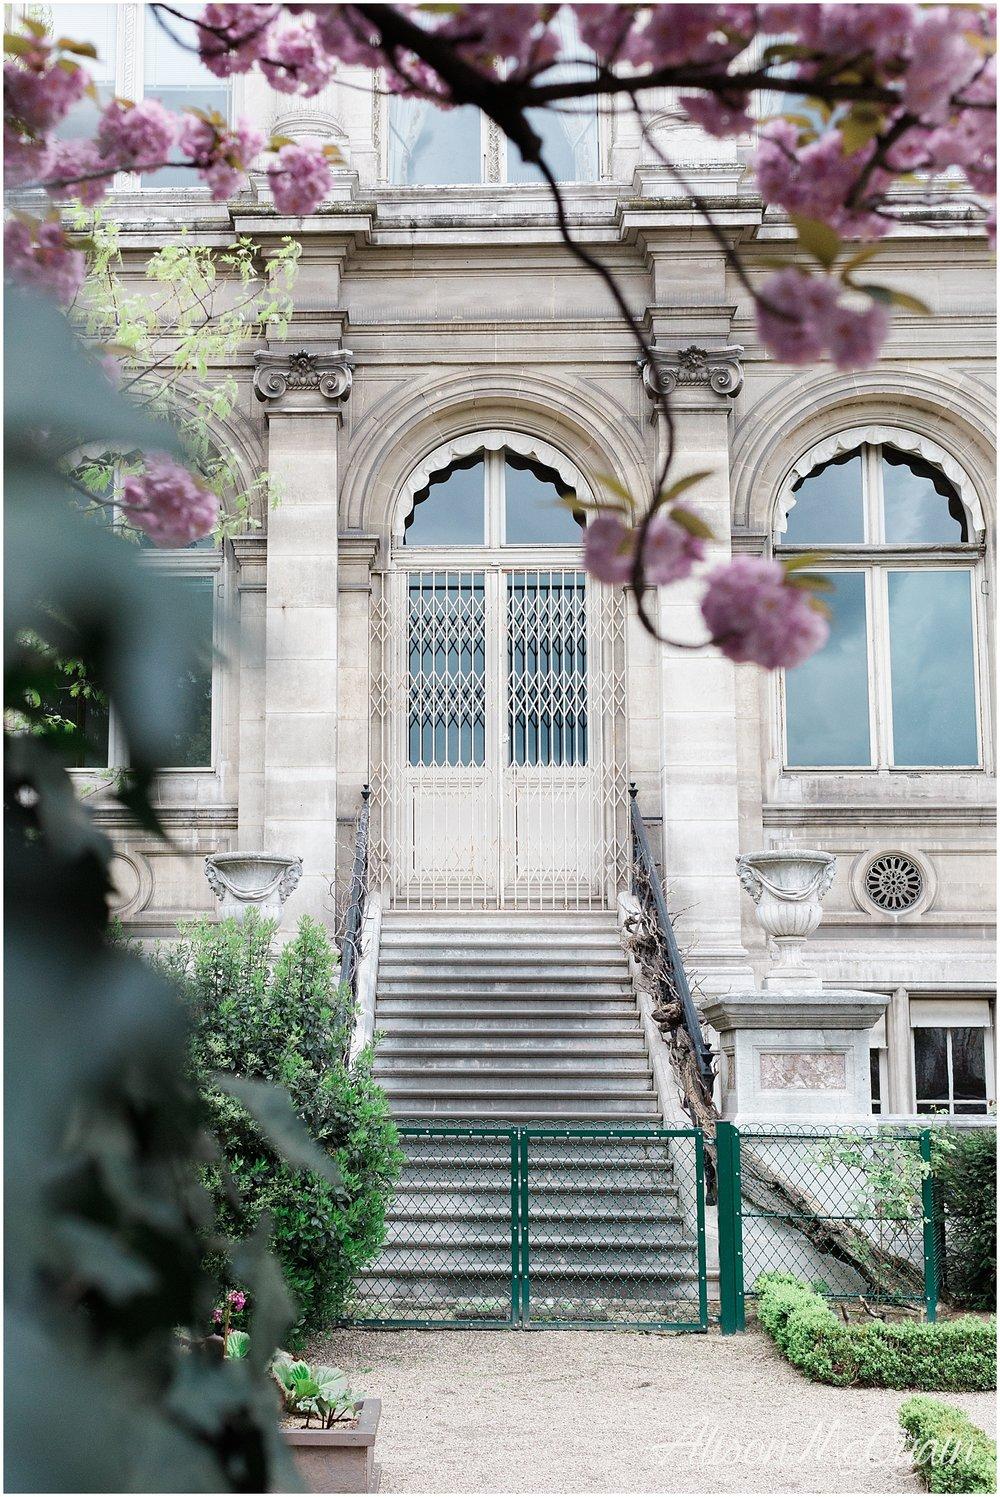 France_Paris_Marseille_Cassis_alisonmcquainphtography2018-04-27_0021.jpg